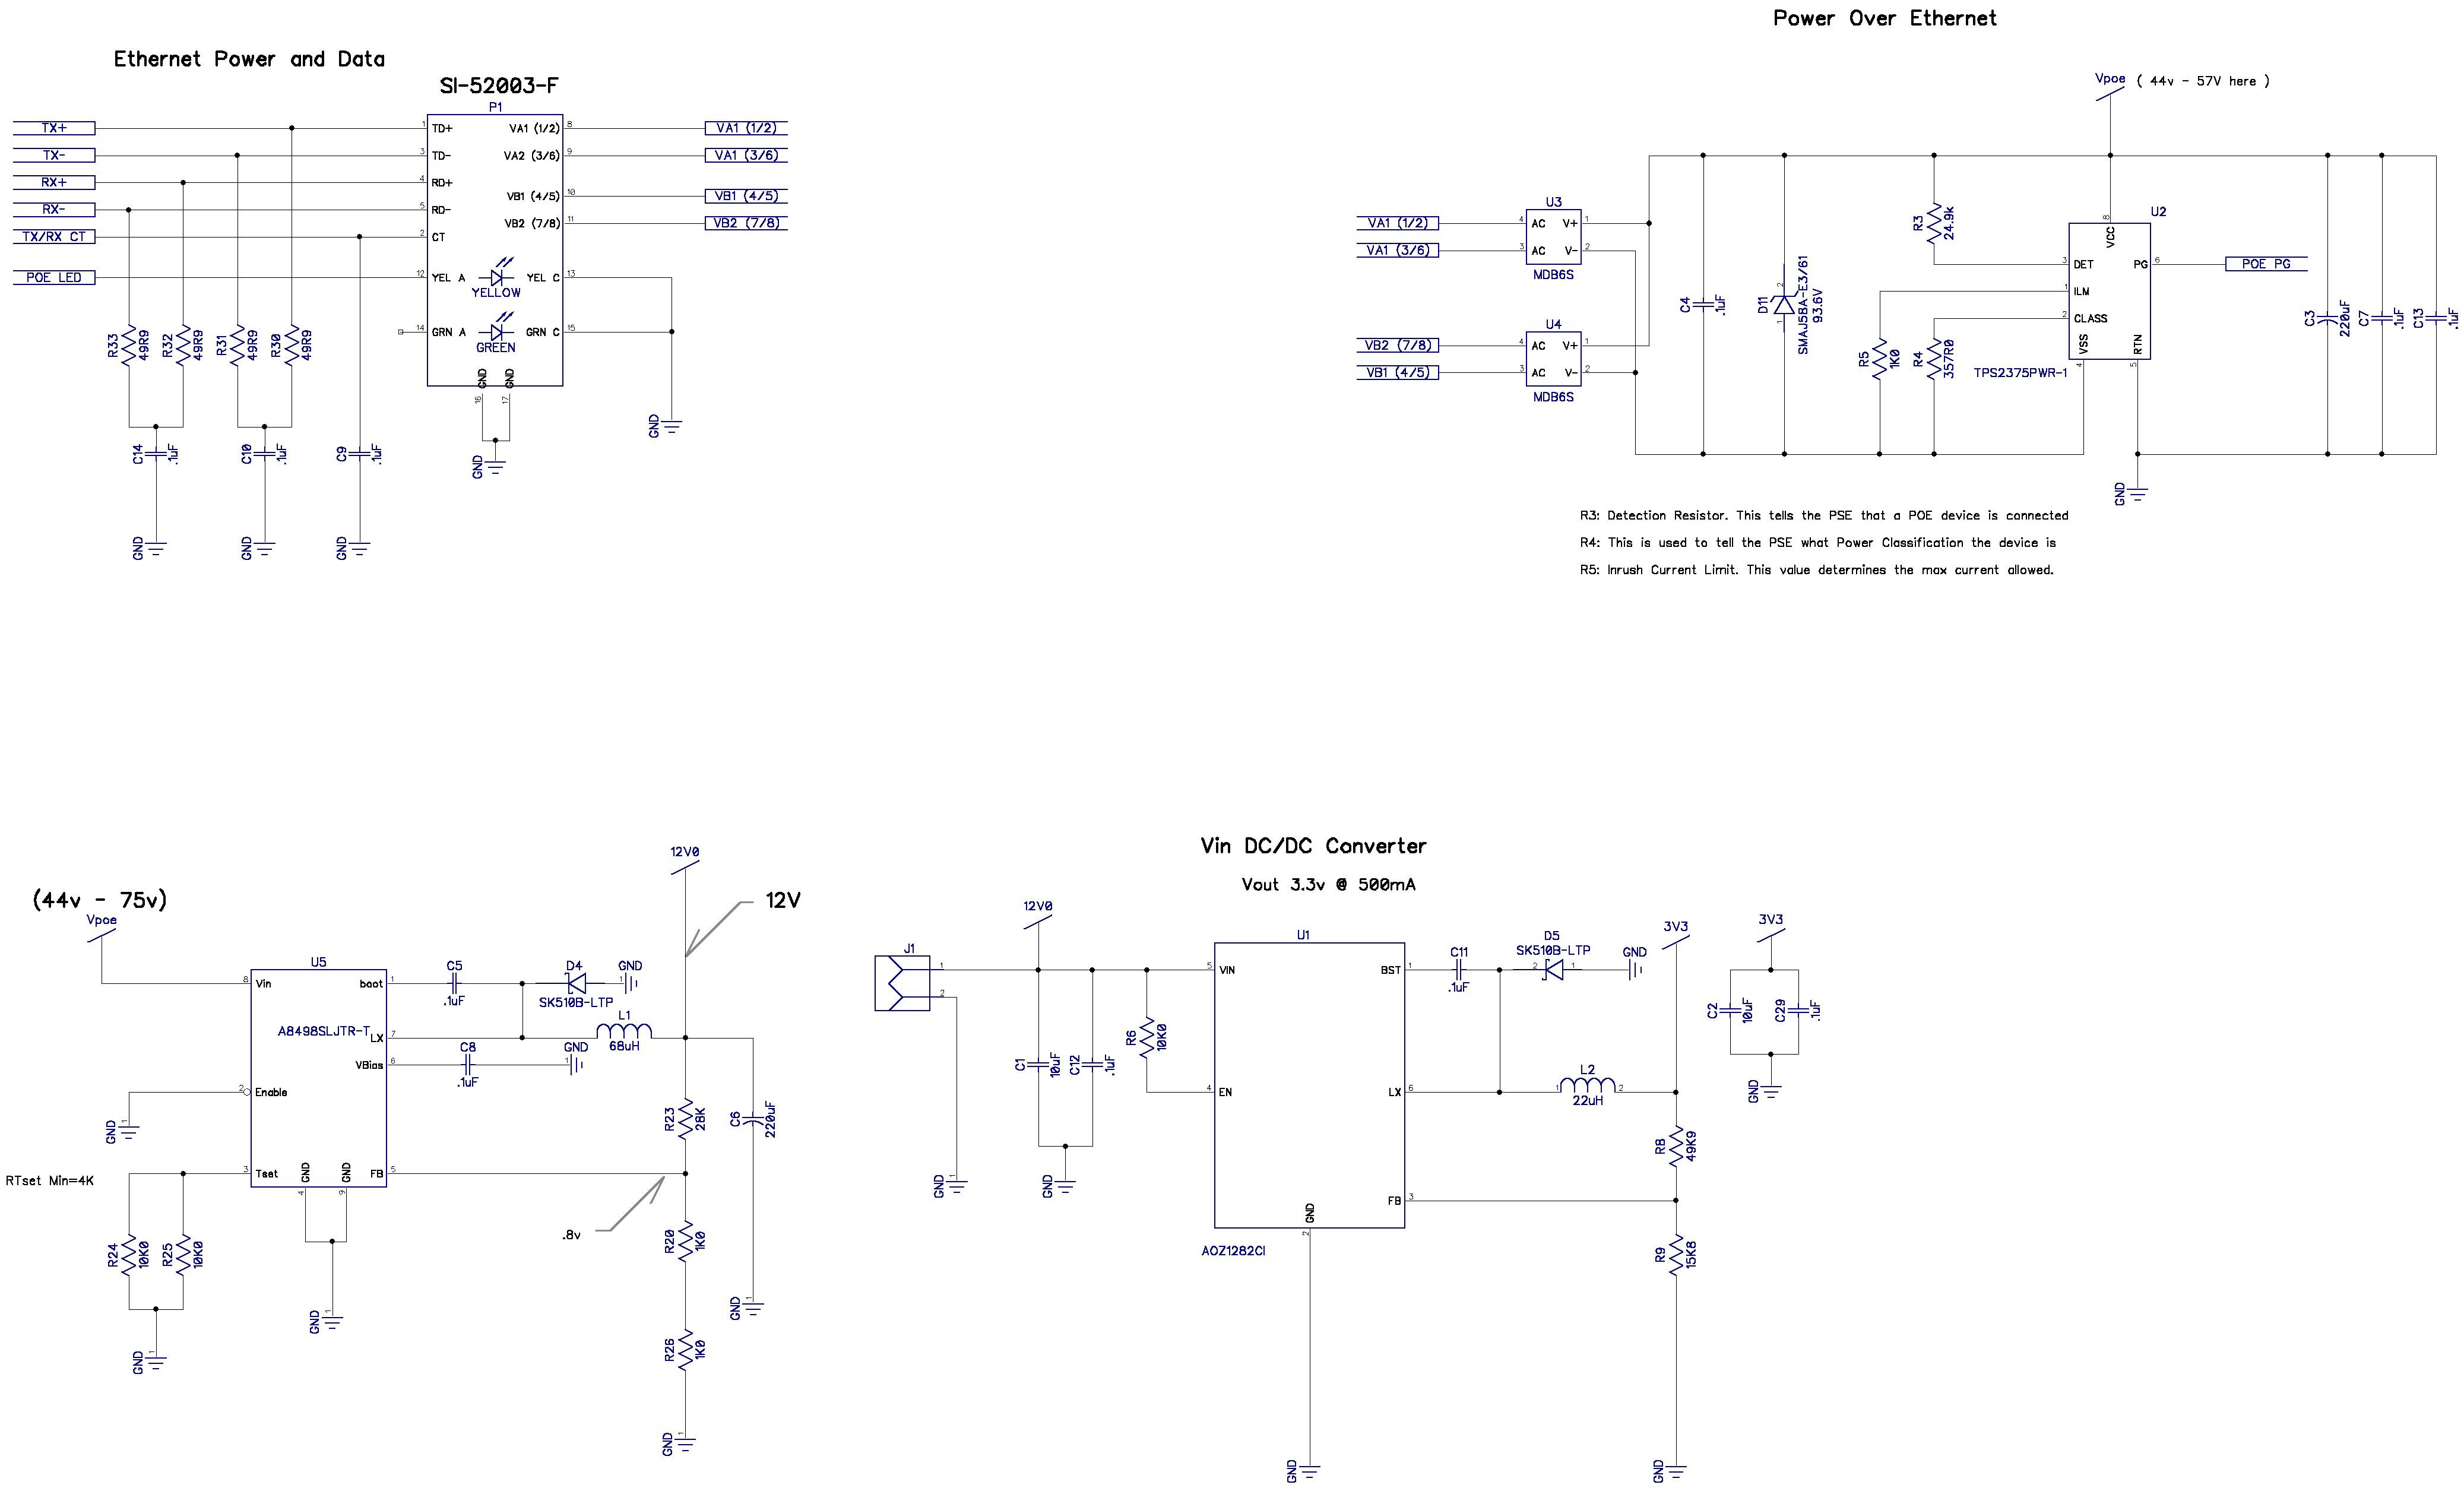 Omega 2 - Ethernet without Ether dock? | Community on